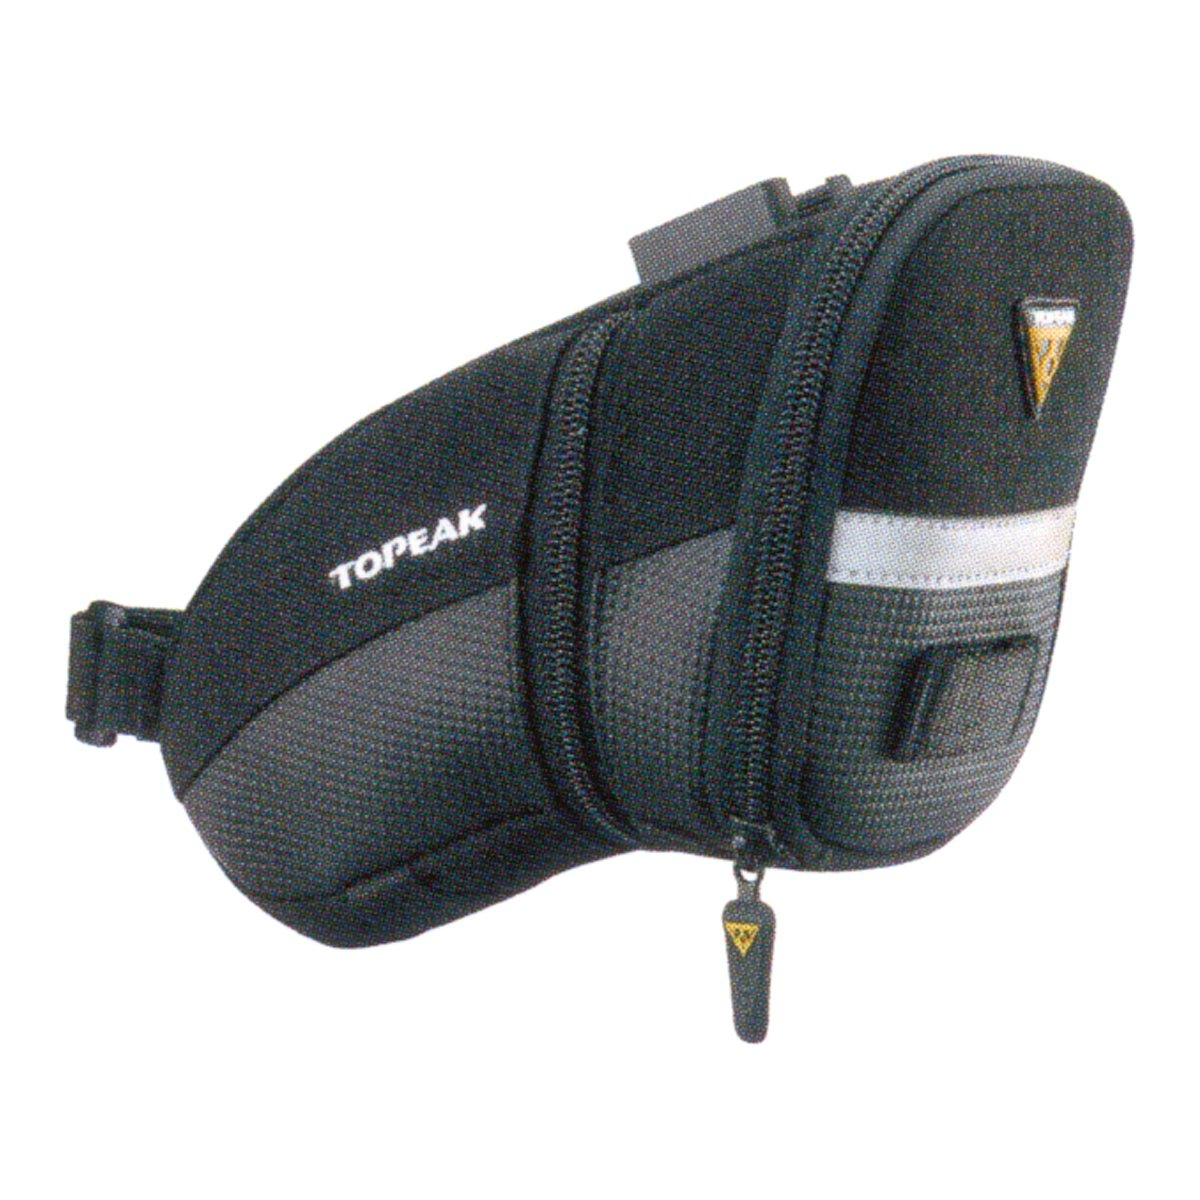 Topeak Aero Wedge with Fixer F25 Seat Pack